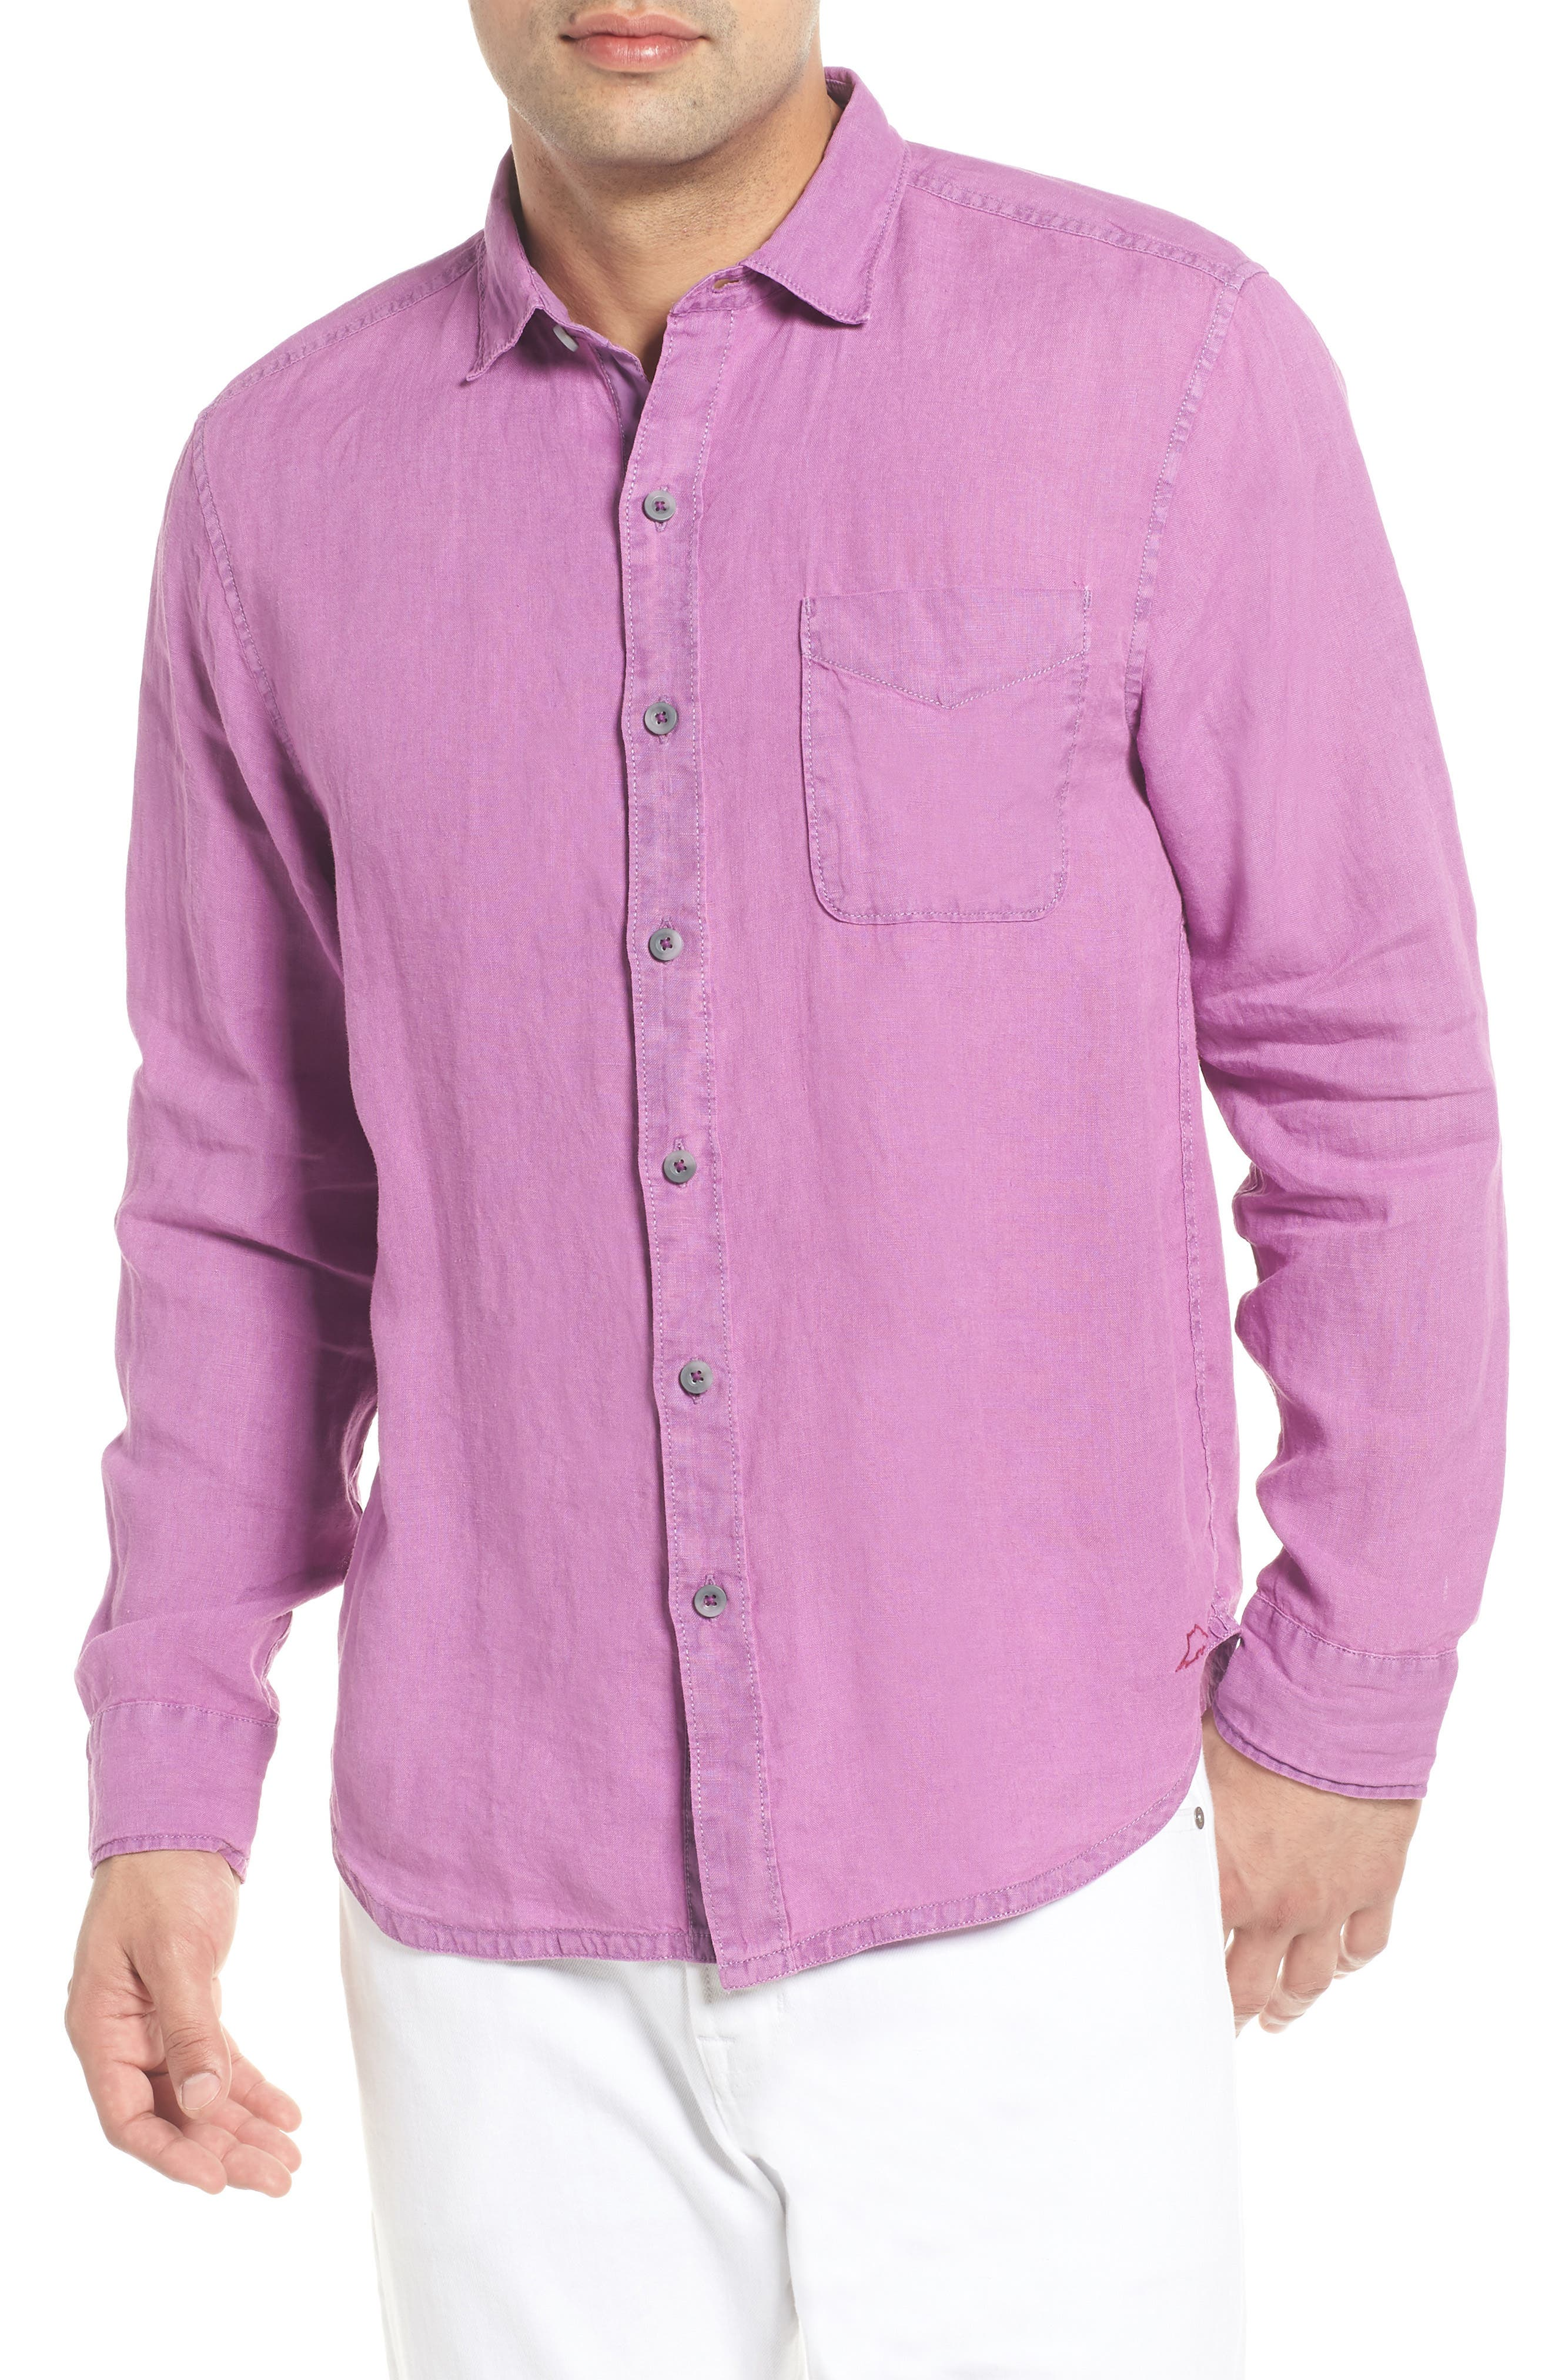 Alternate Image 1 Selected - Tommy Bahama Seaspray Breezer Standard Fit Linen Sport Shirt